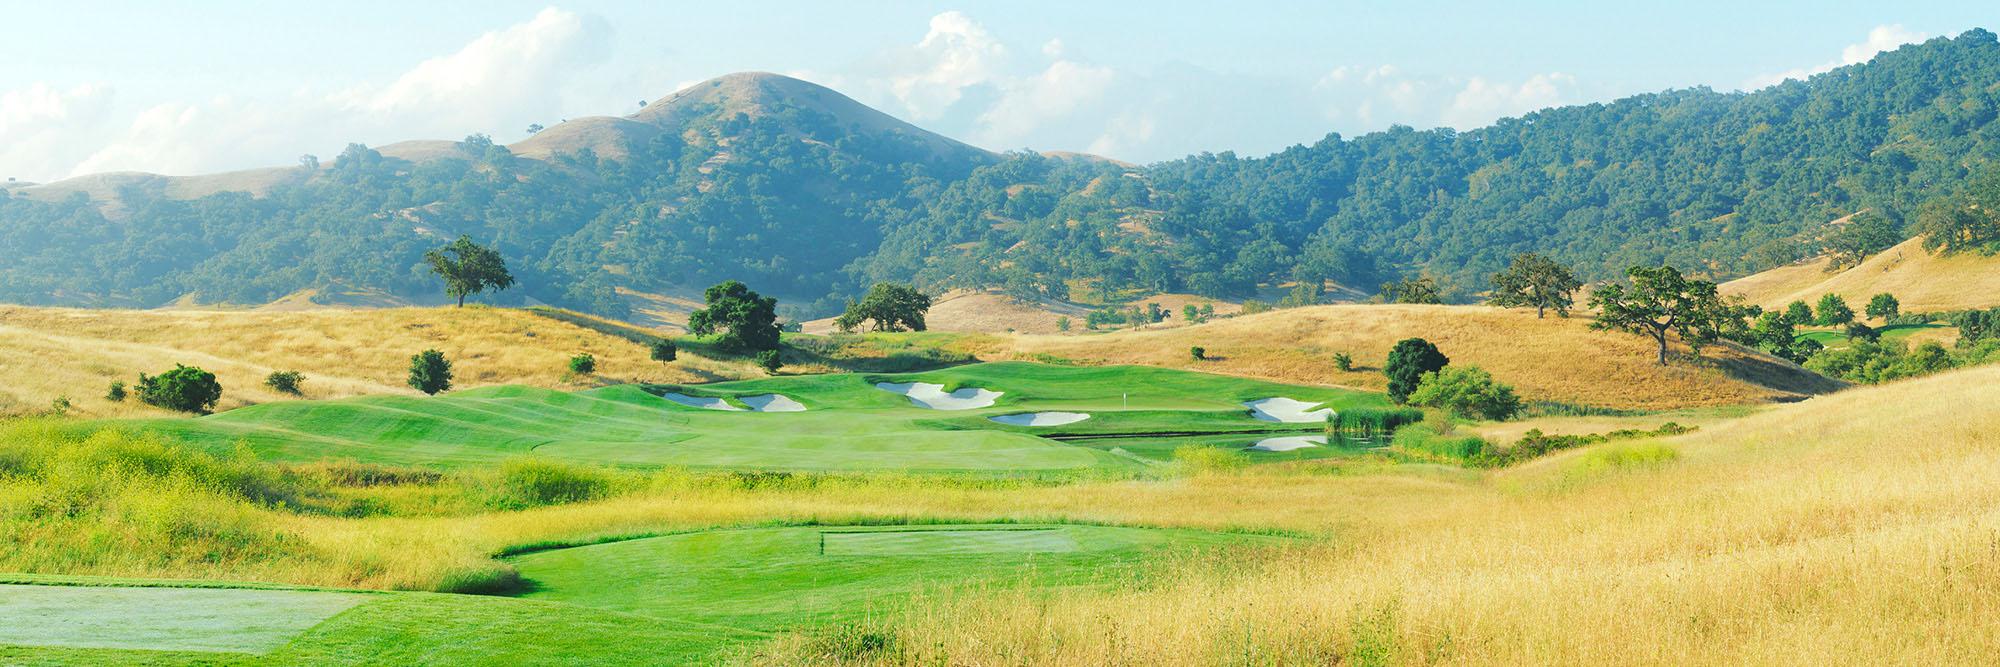 Golf Course Image - CordeValle Golf Club No. 8